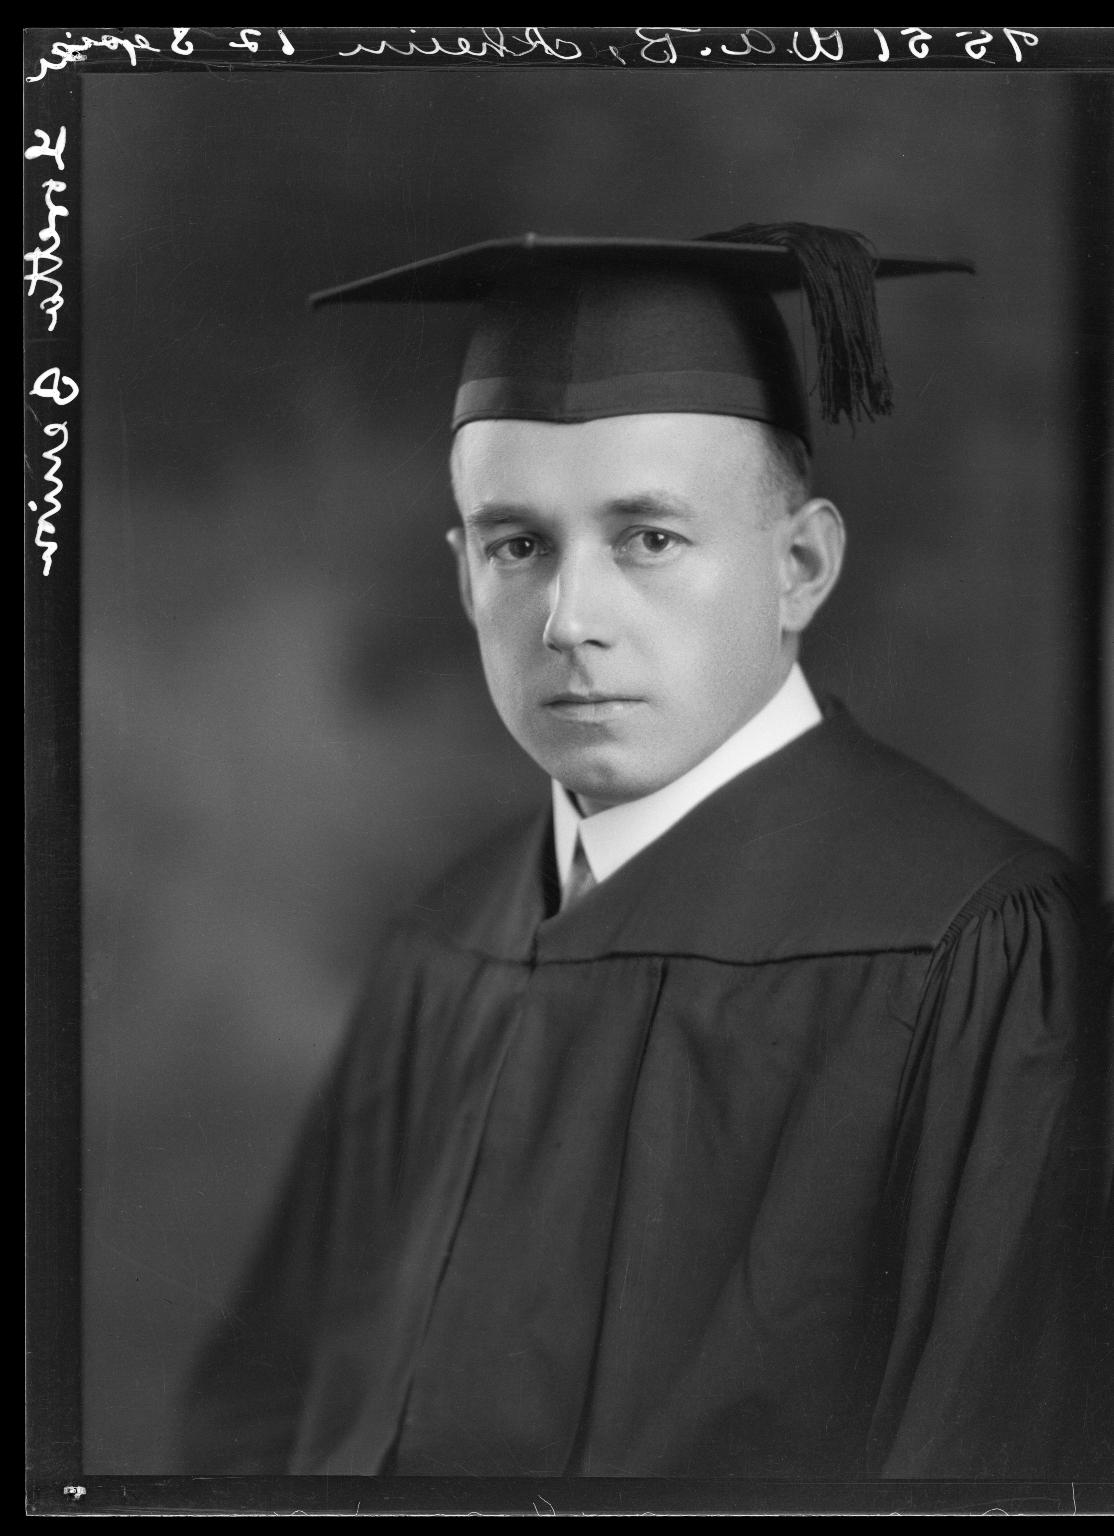 Portraits of W. A. Buckheim